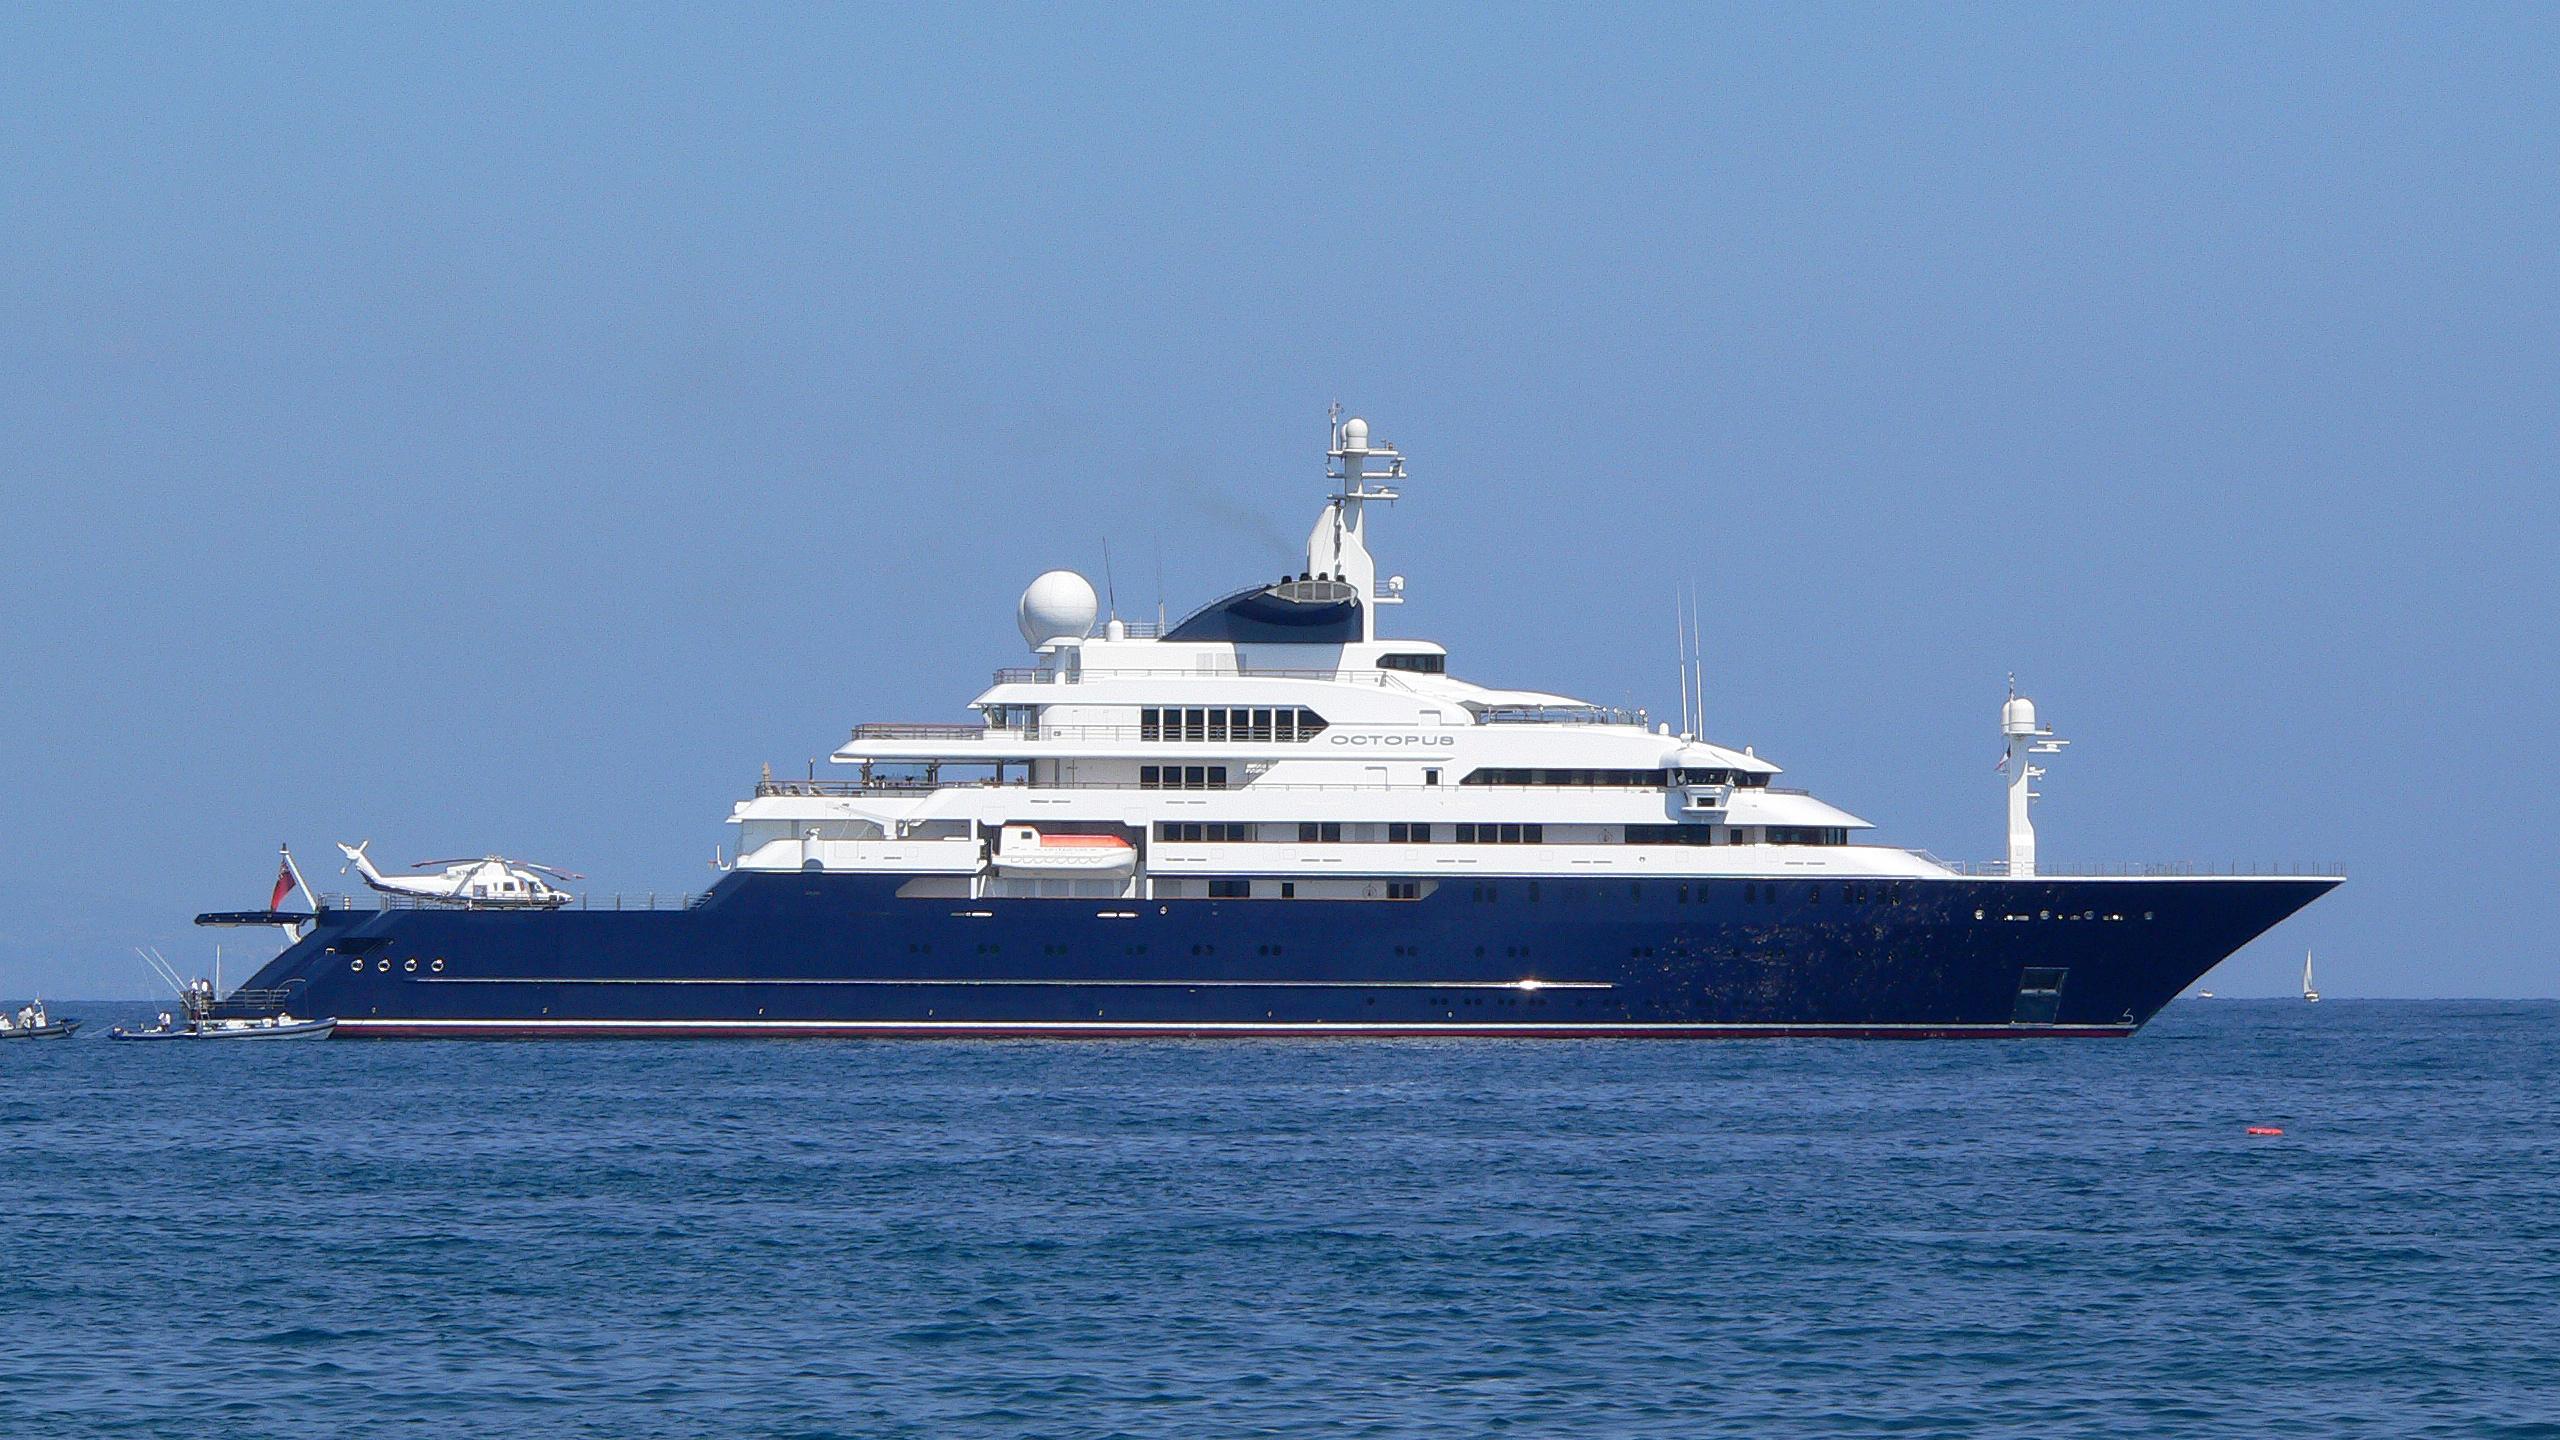 octopus-explorer-yacht-lurssen-2003-126m-moored